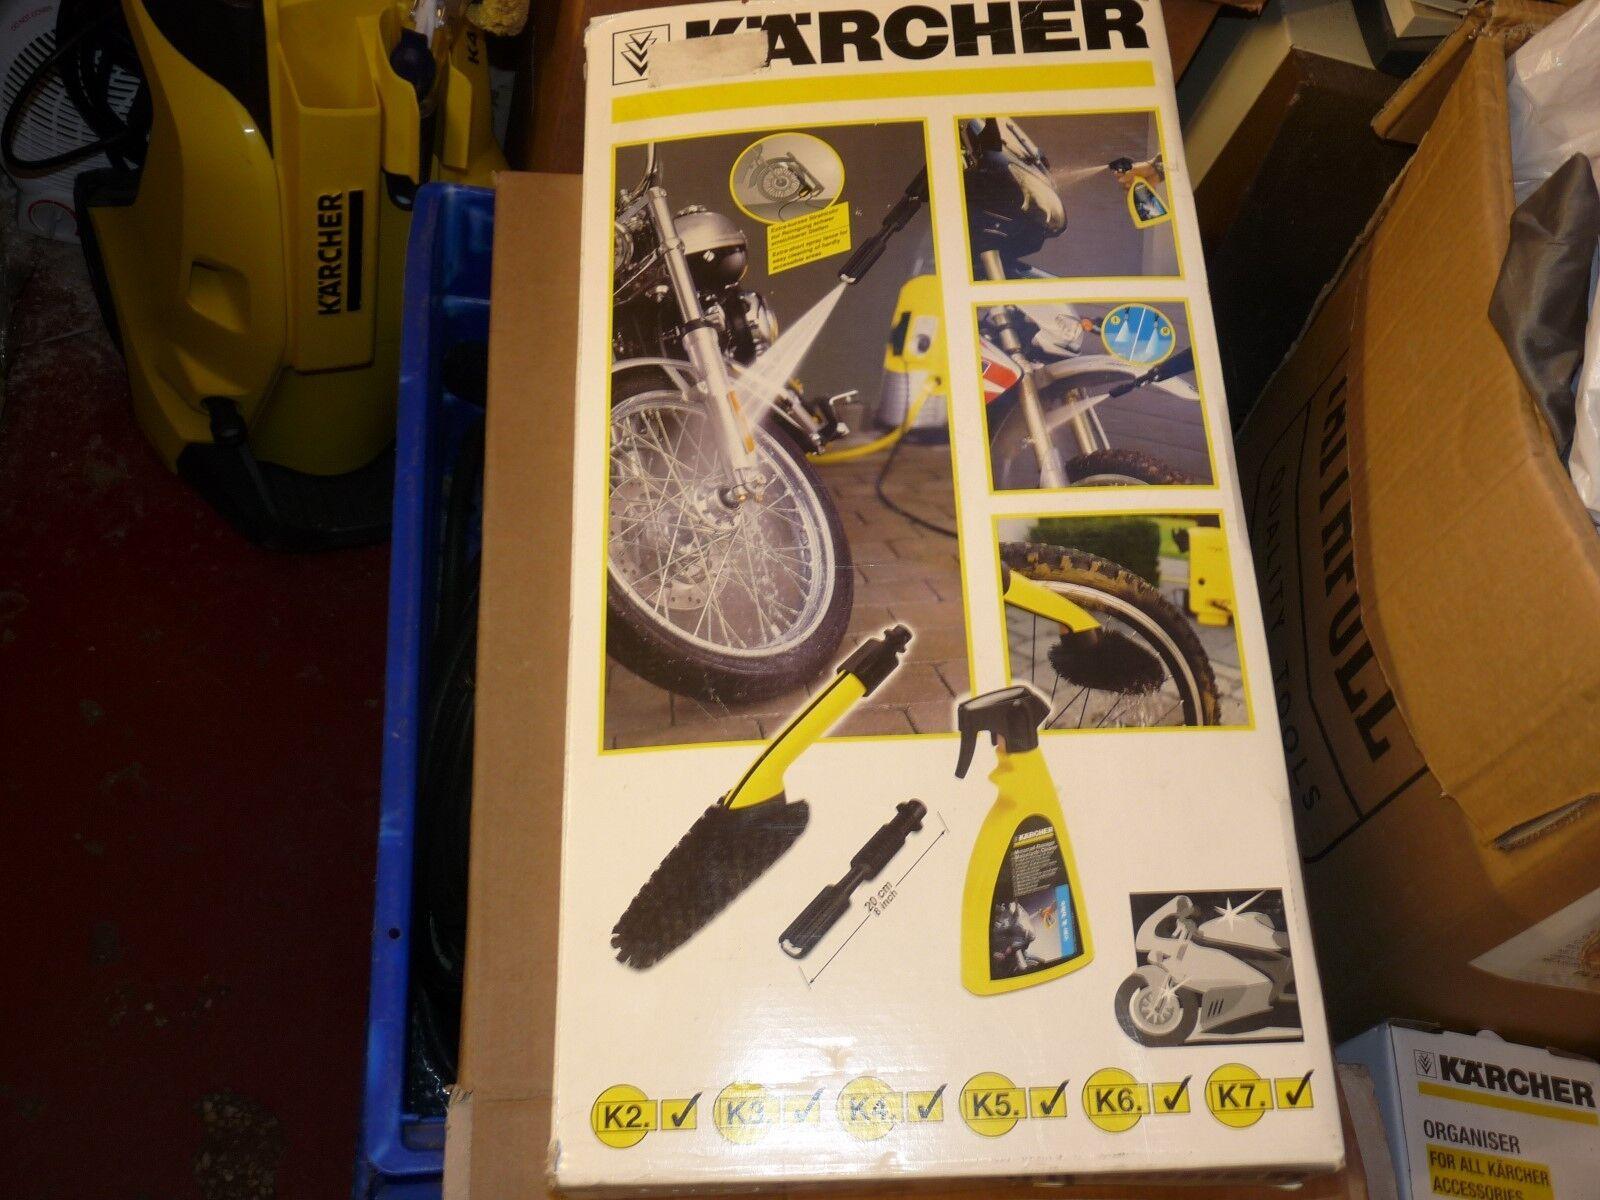 Karcher Bici del motor kit de limpieza